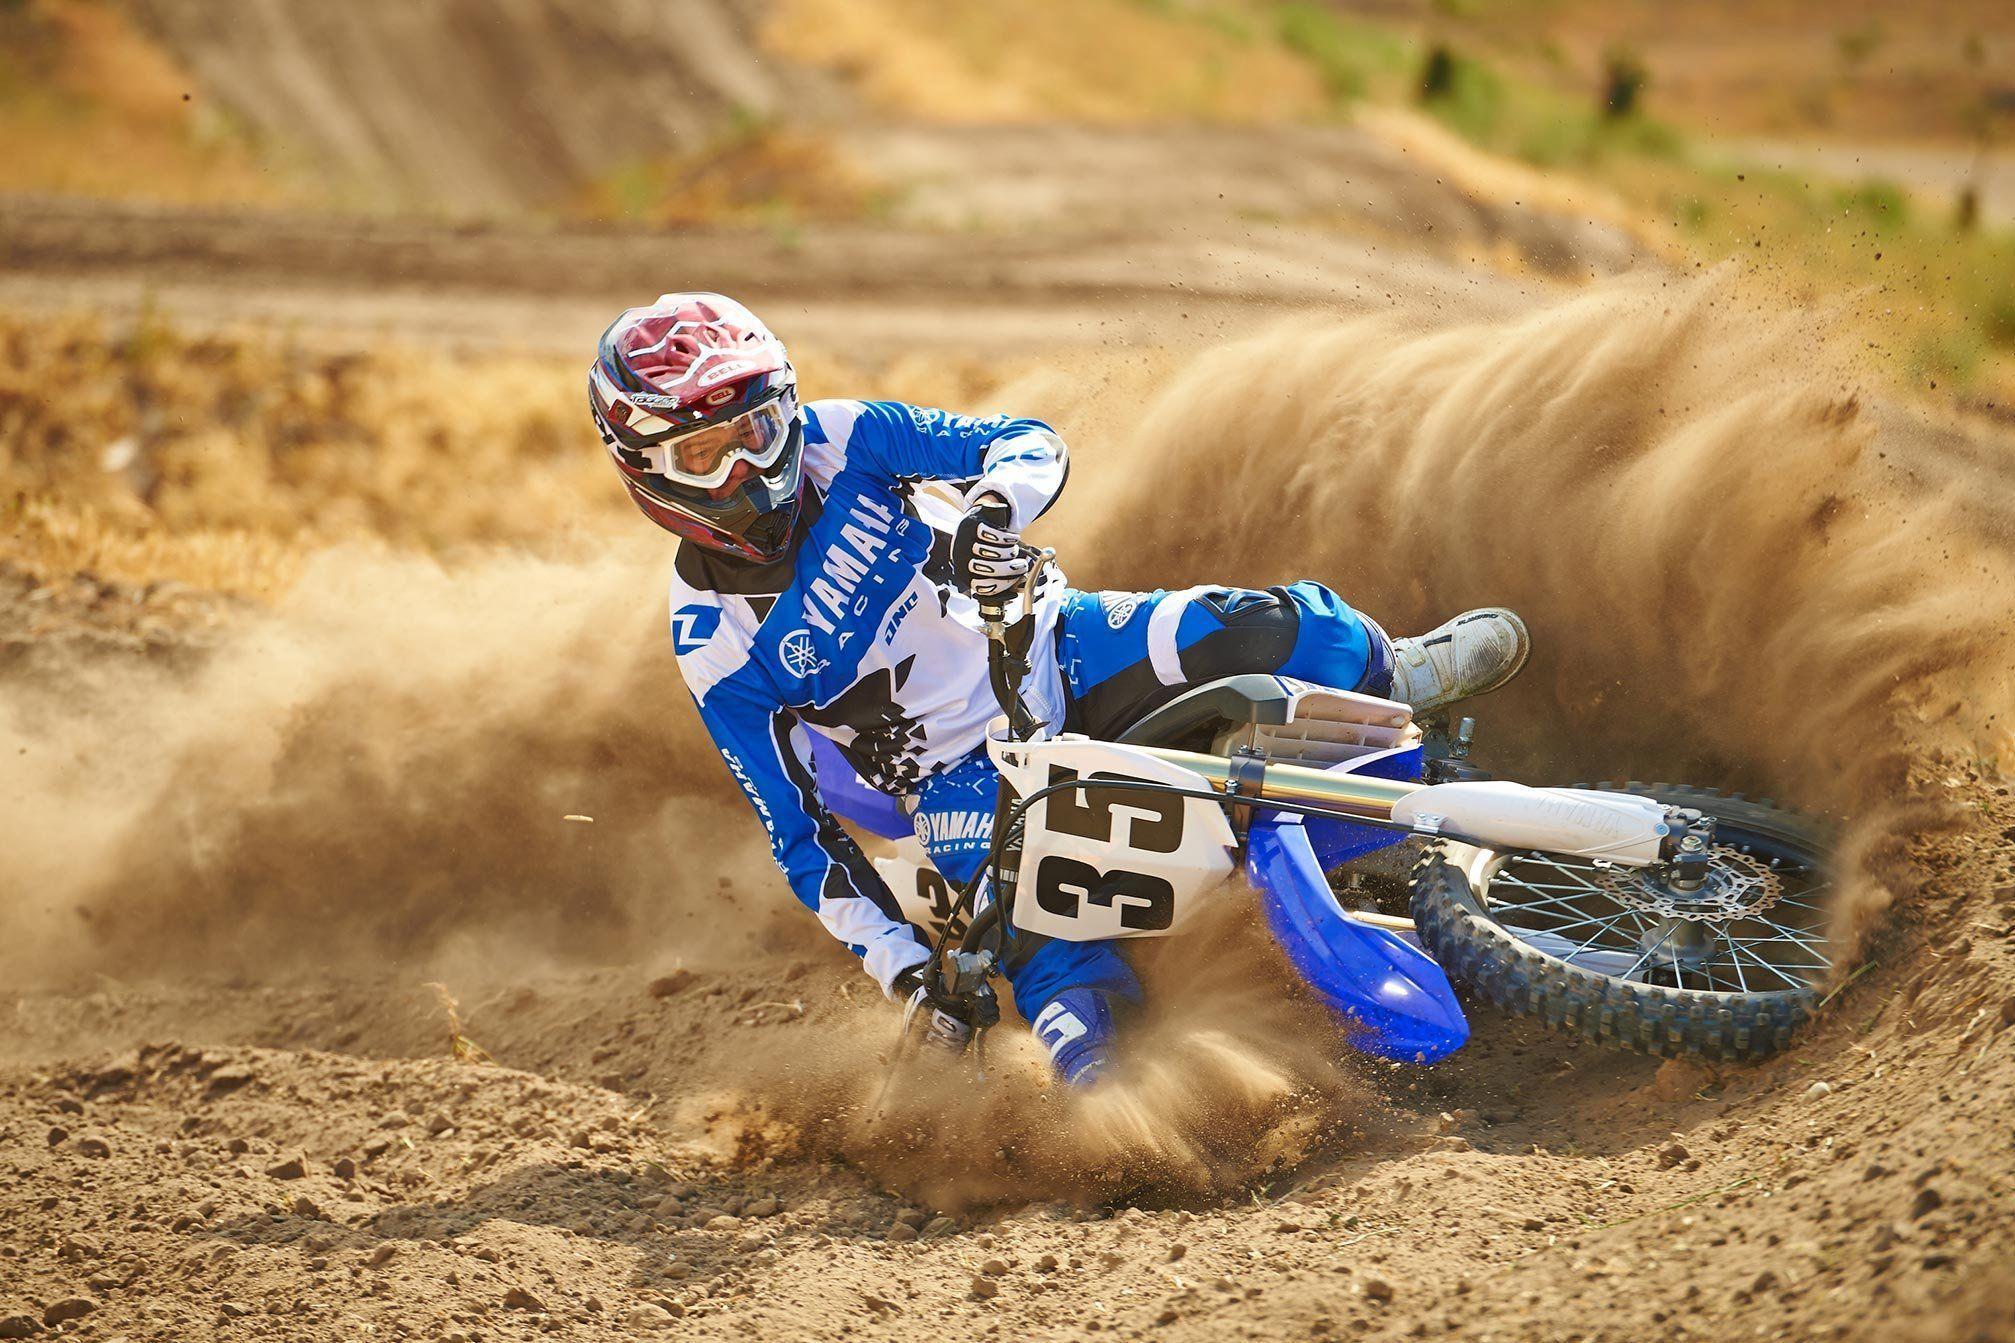 Yamaha Yz450f Dirt Motorcycle Wallpaper Hd Desktop: Motocross 2015 Wallpapers